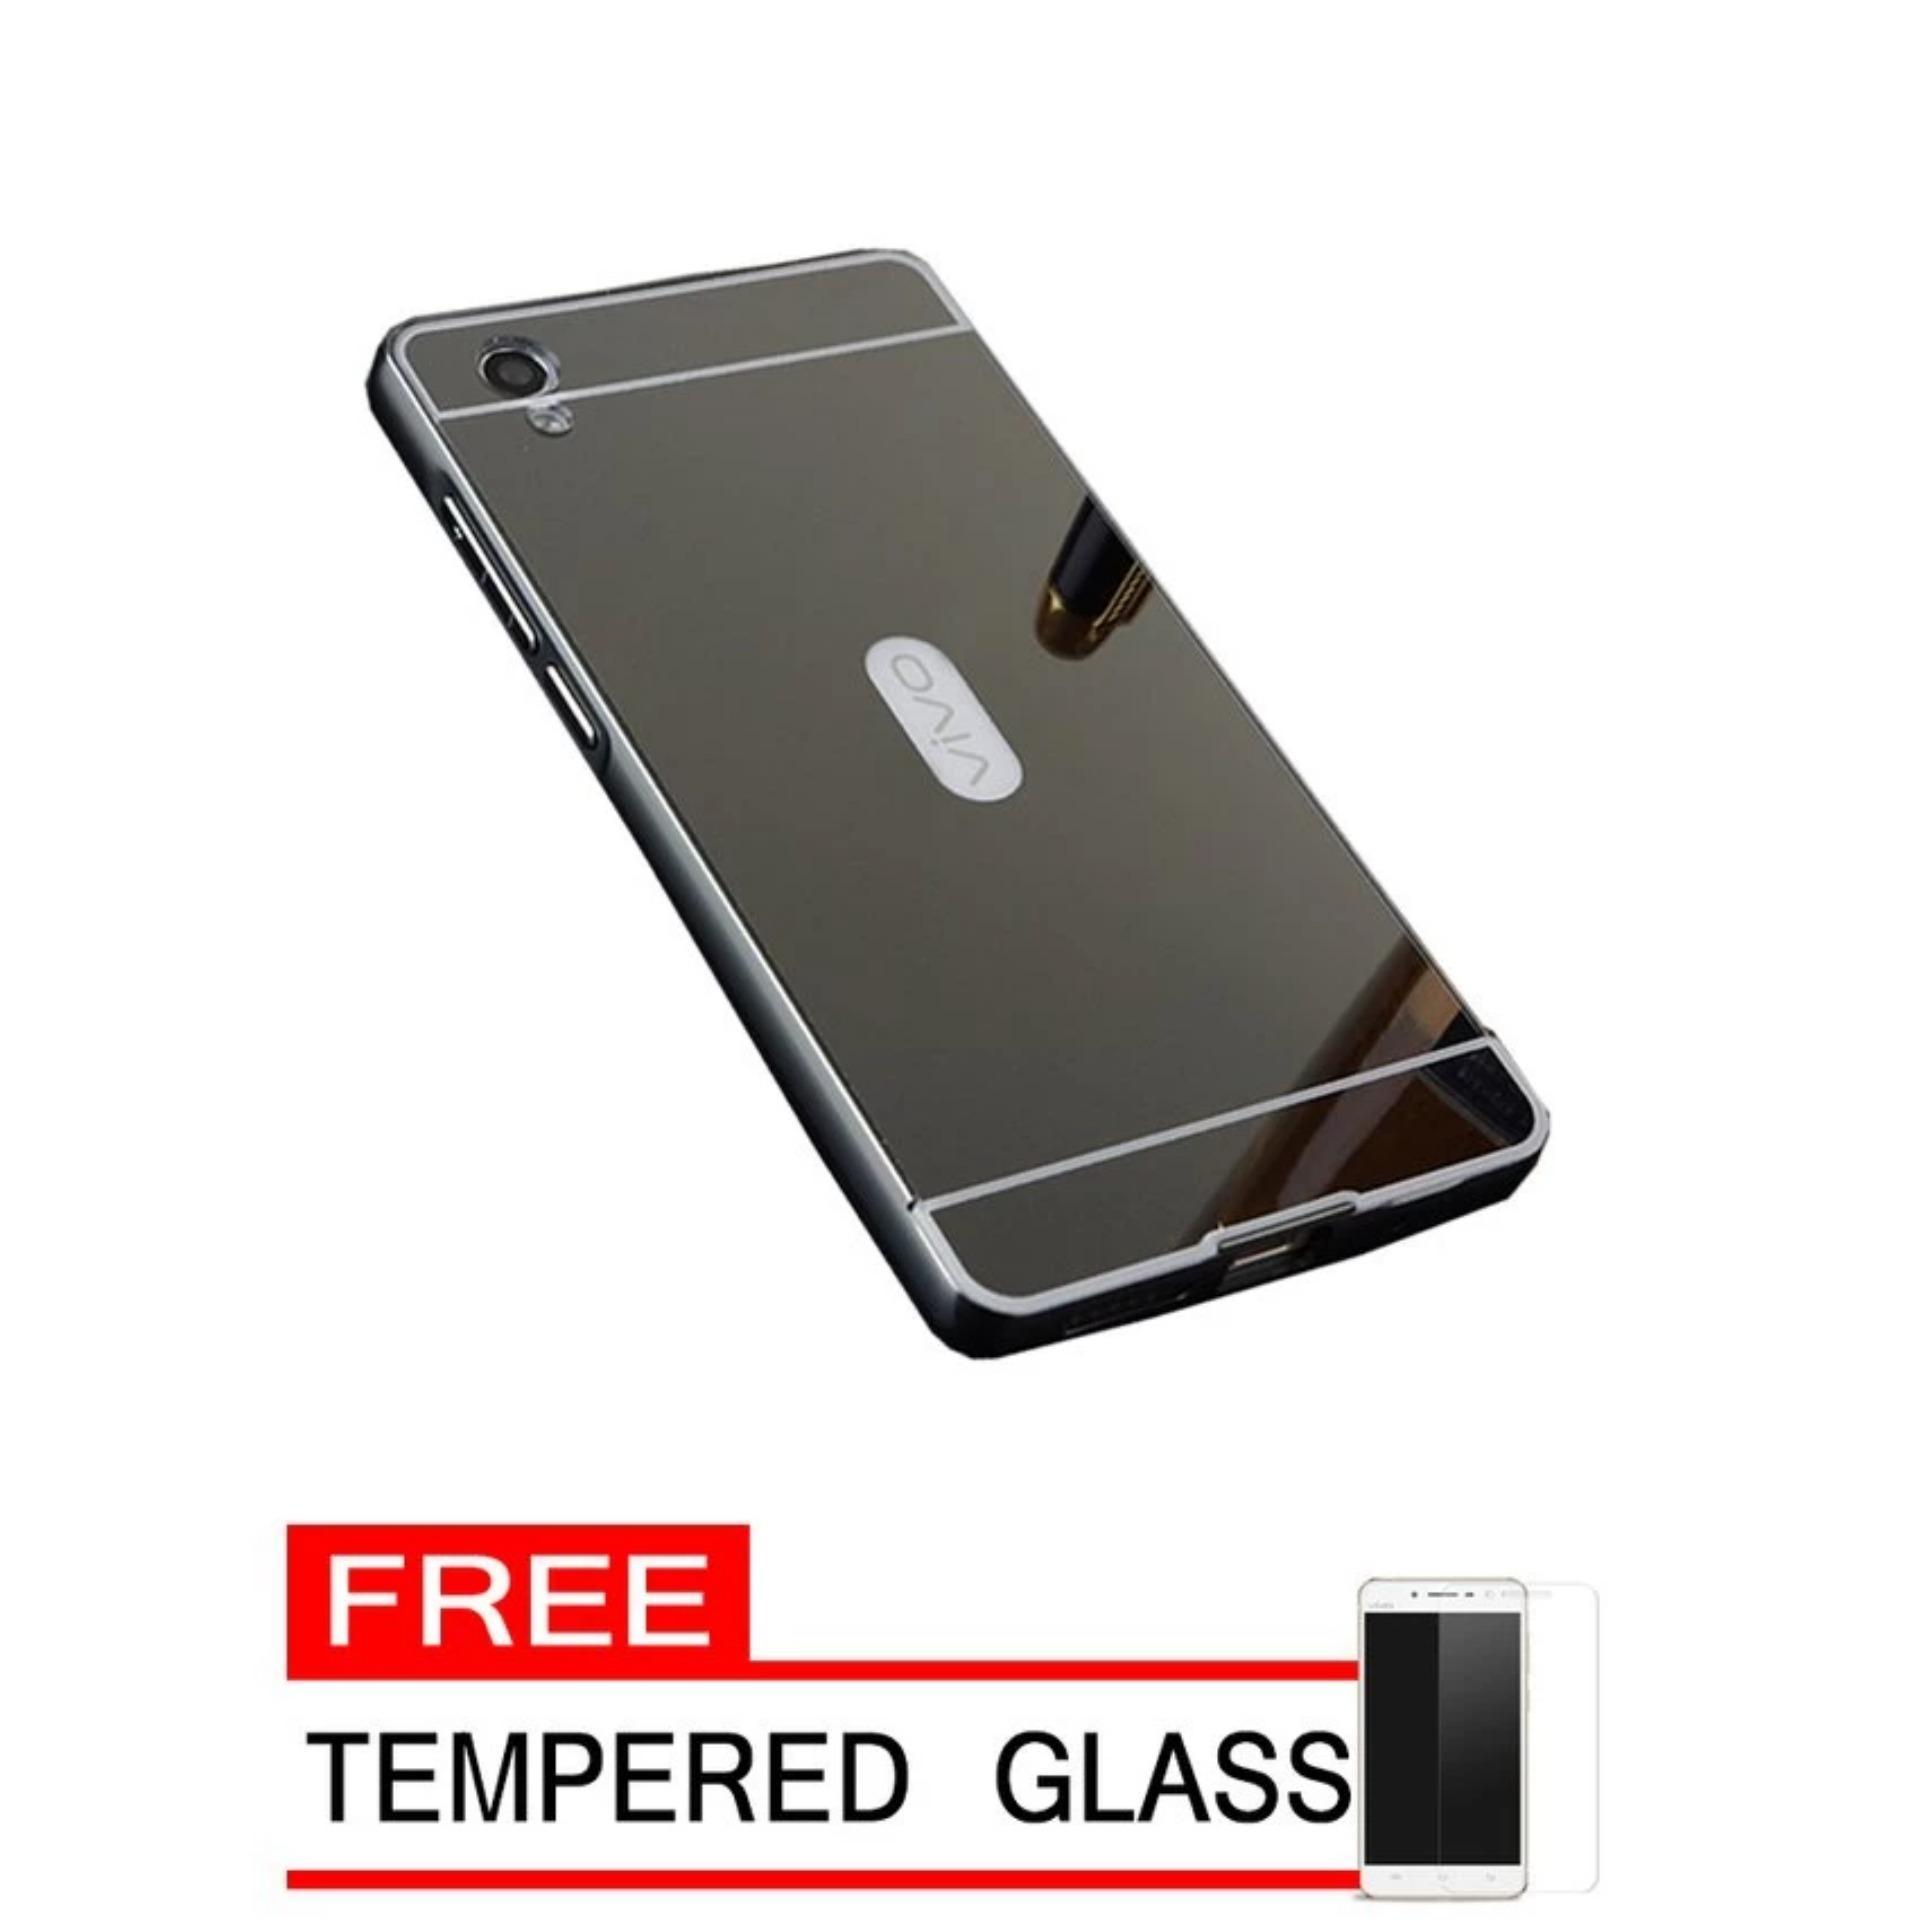 Case For Vivo Y15 Bumper Slide Mirror - Black + Free Tempered Glass .